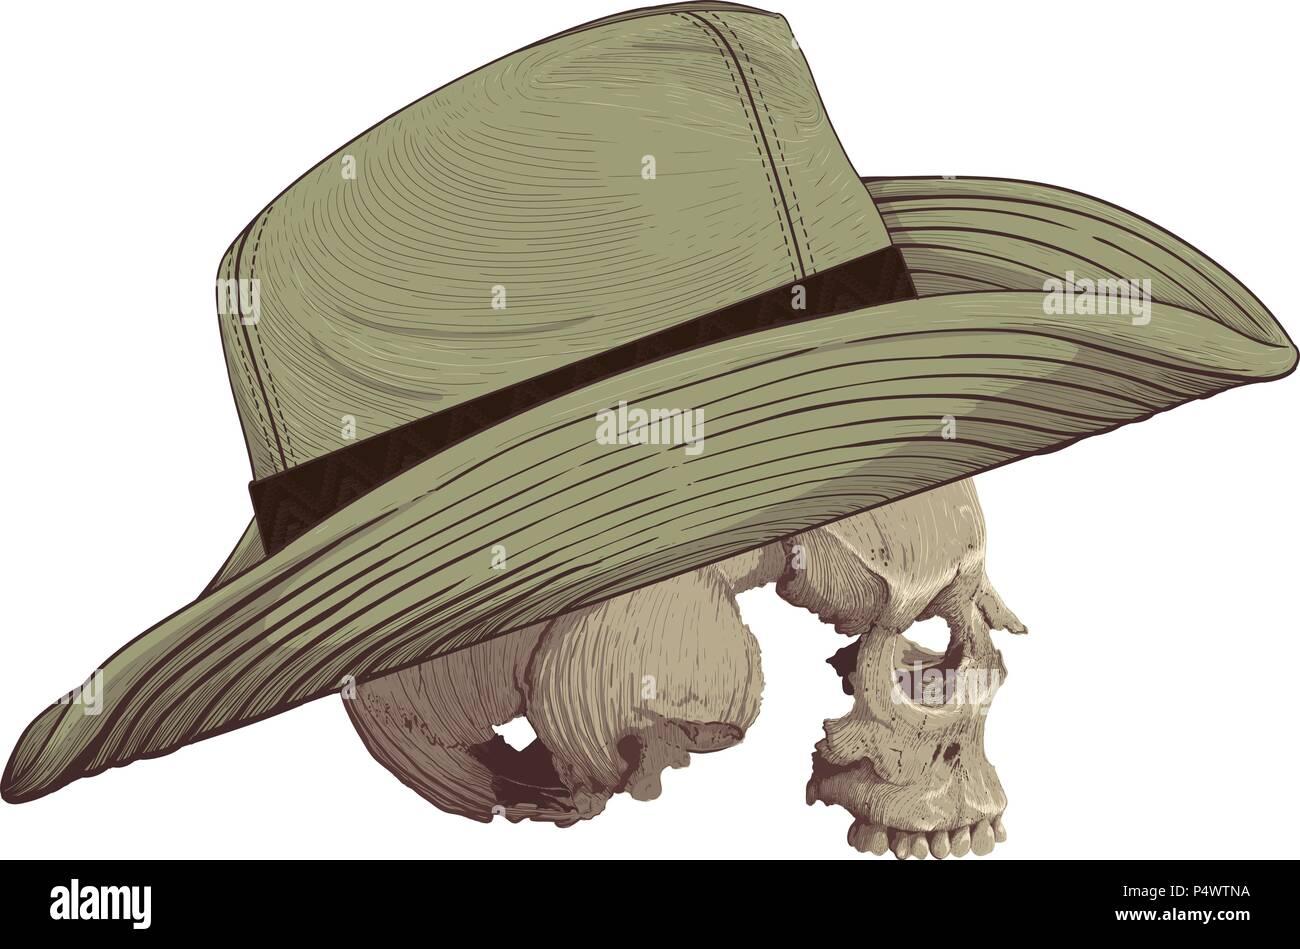 Cowboy Skull Drawing In Vintage Immagini   Cowboy Skull Drawing In ... acb4720604c9